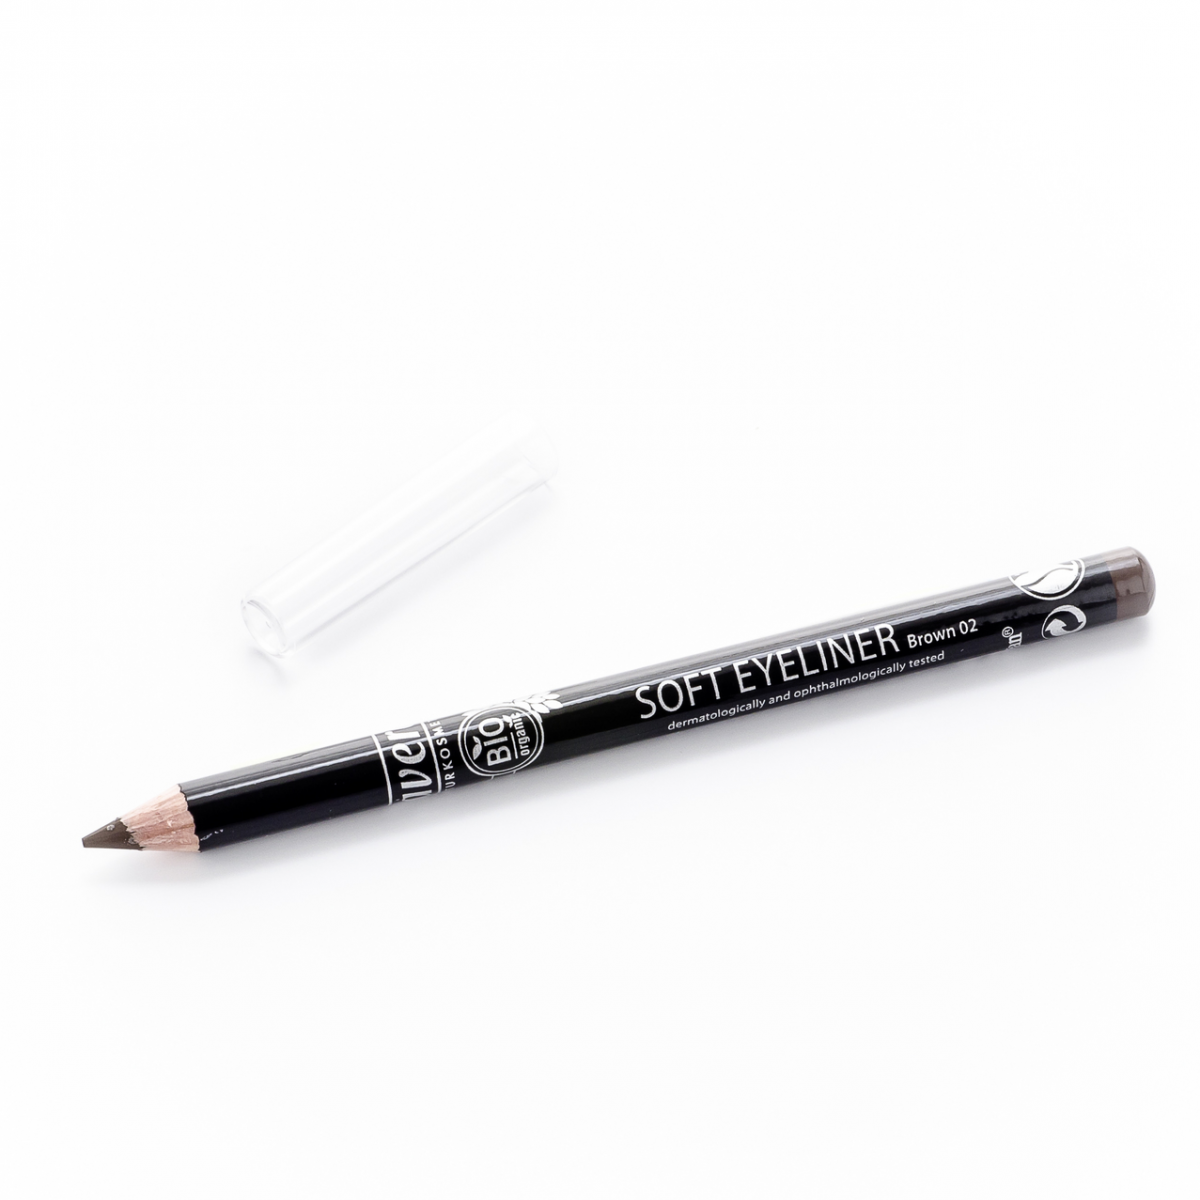 Soft Eyeliner -Brown 02- Stift 1.14 g - Lavera